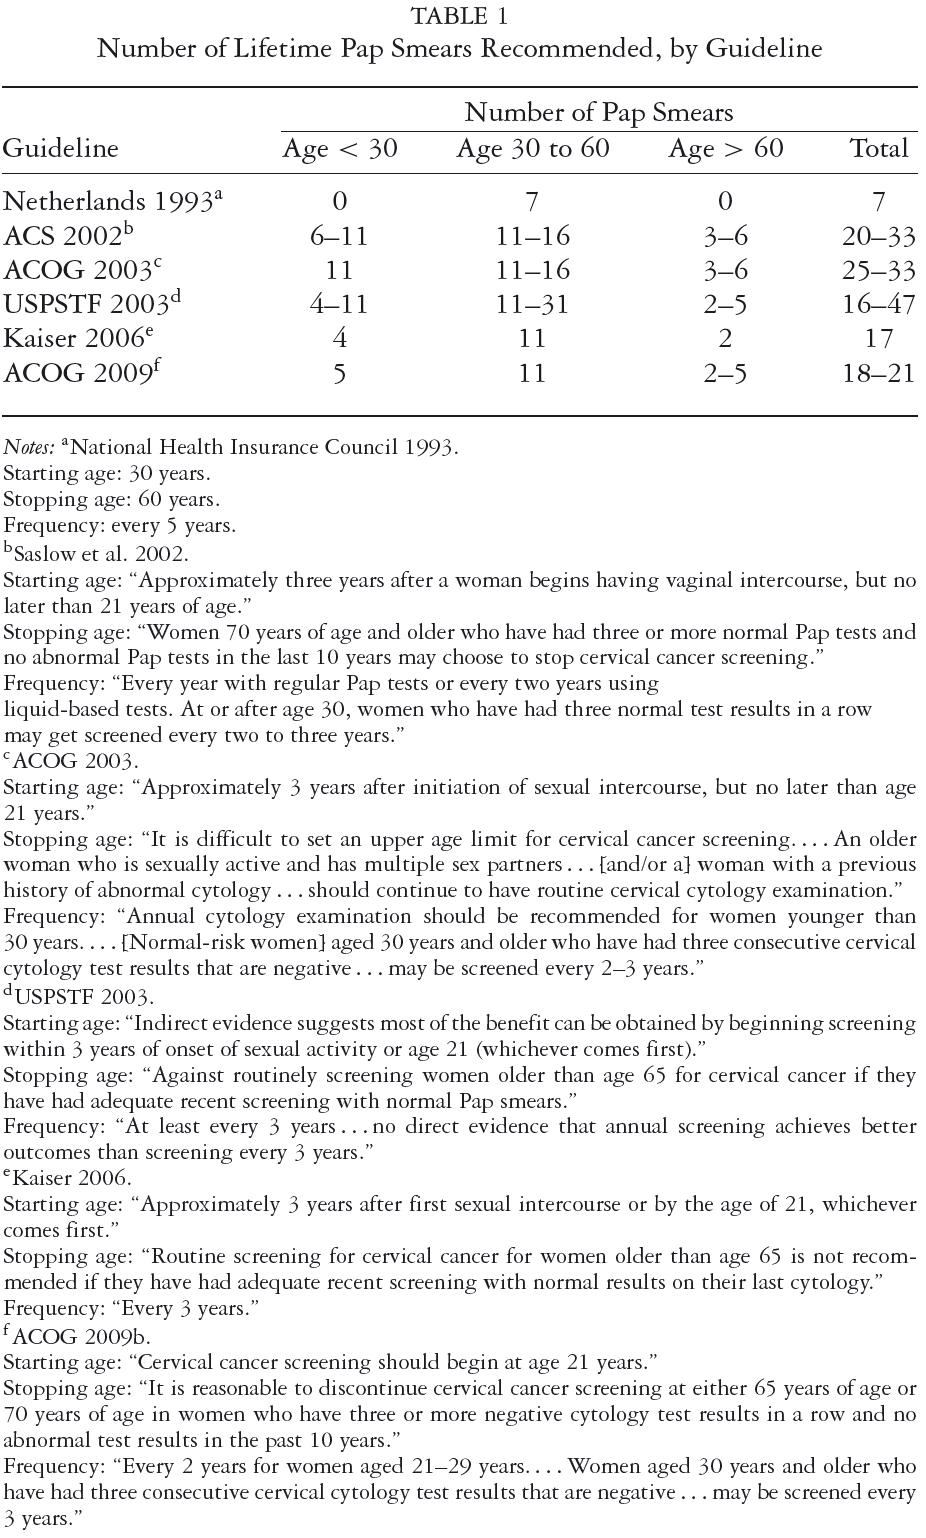 The Milbank Quarterly Vol 90 No 1 2012 Pp 5 37